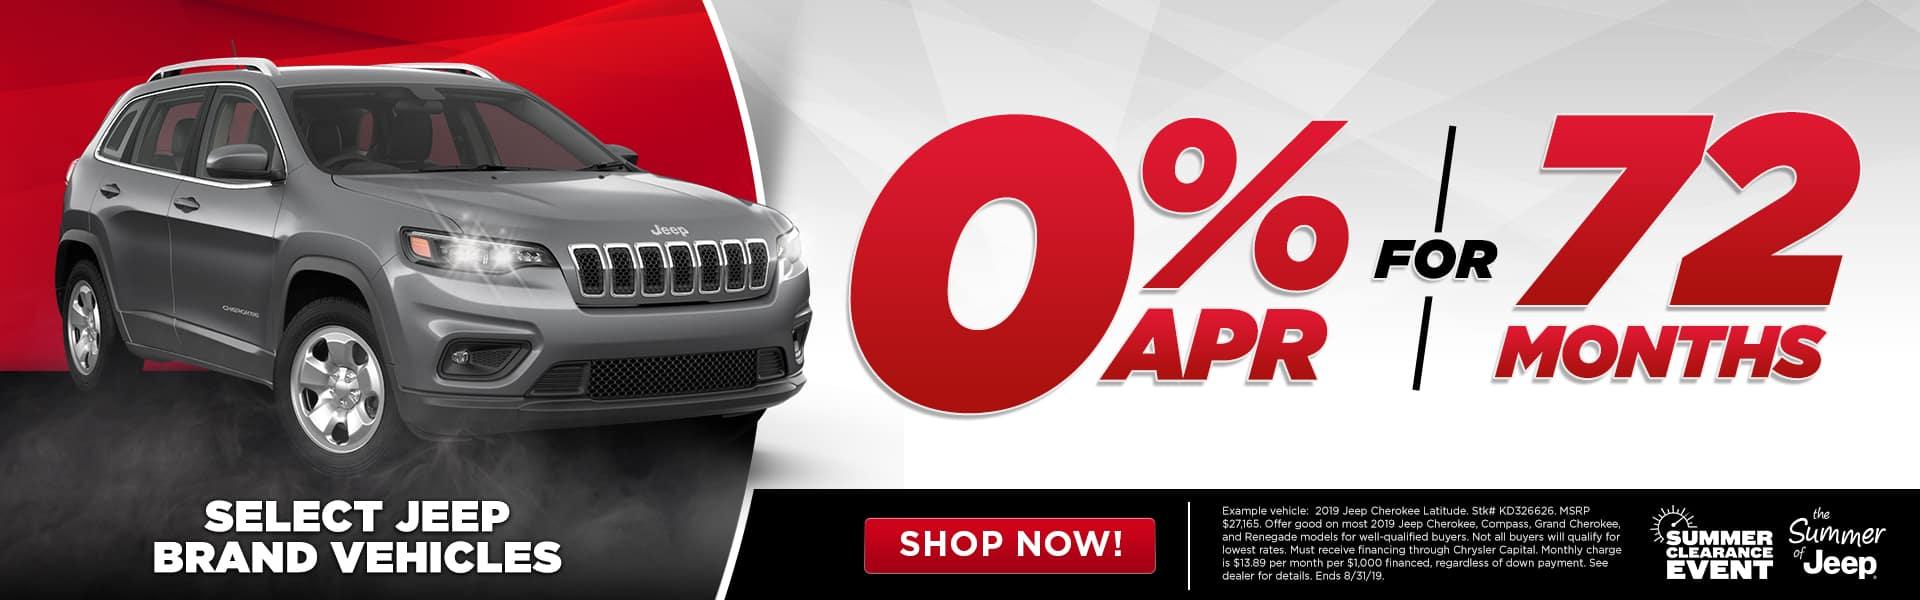 Dodge Chrysler Jeep Ram Dealership Dallas TX | Dallas Dodge